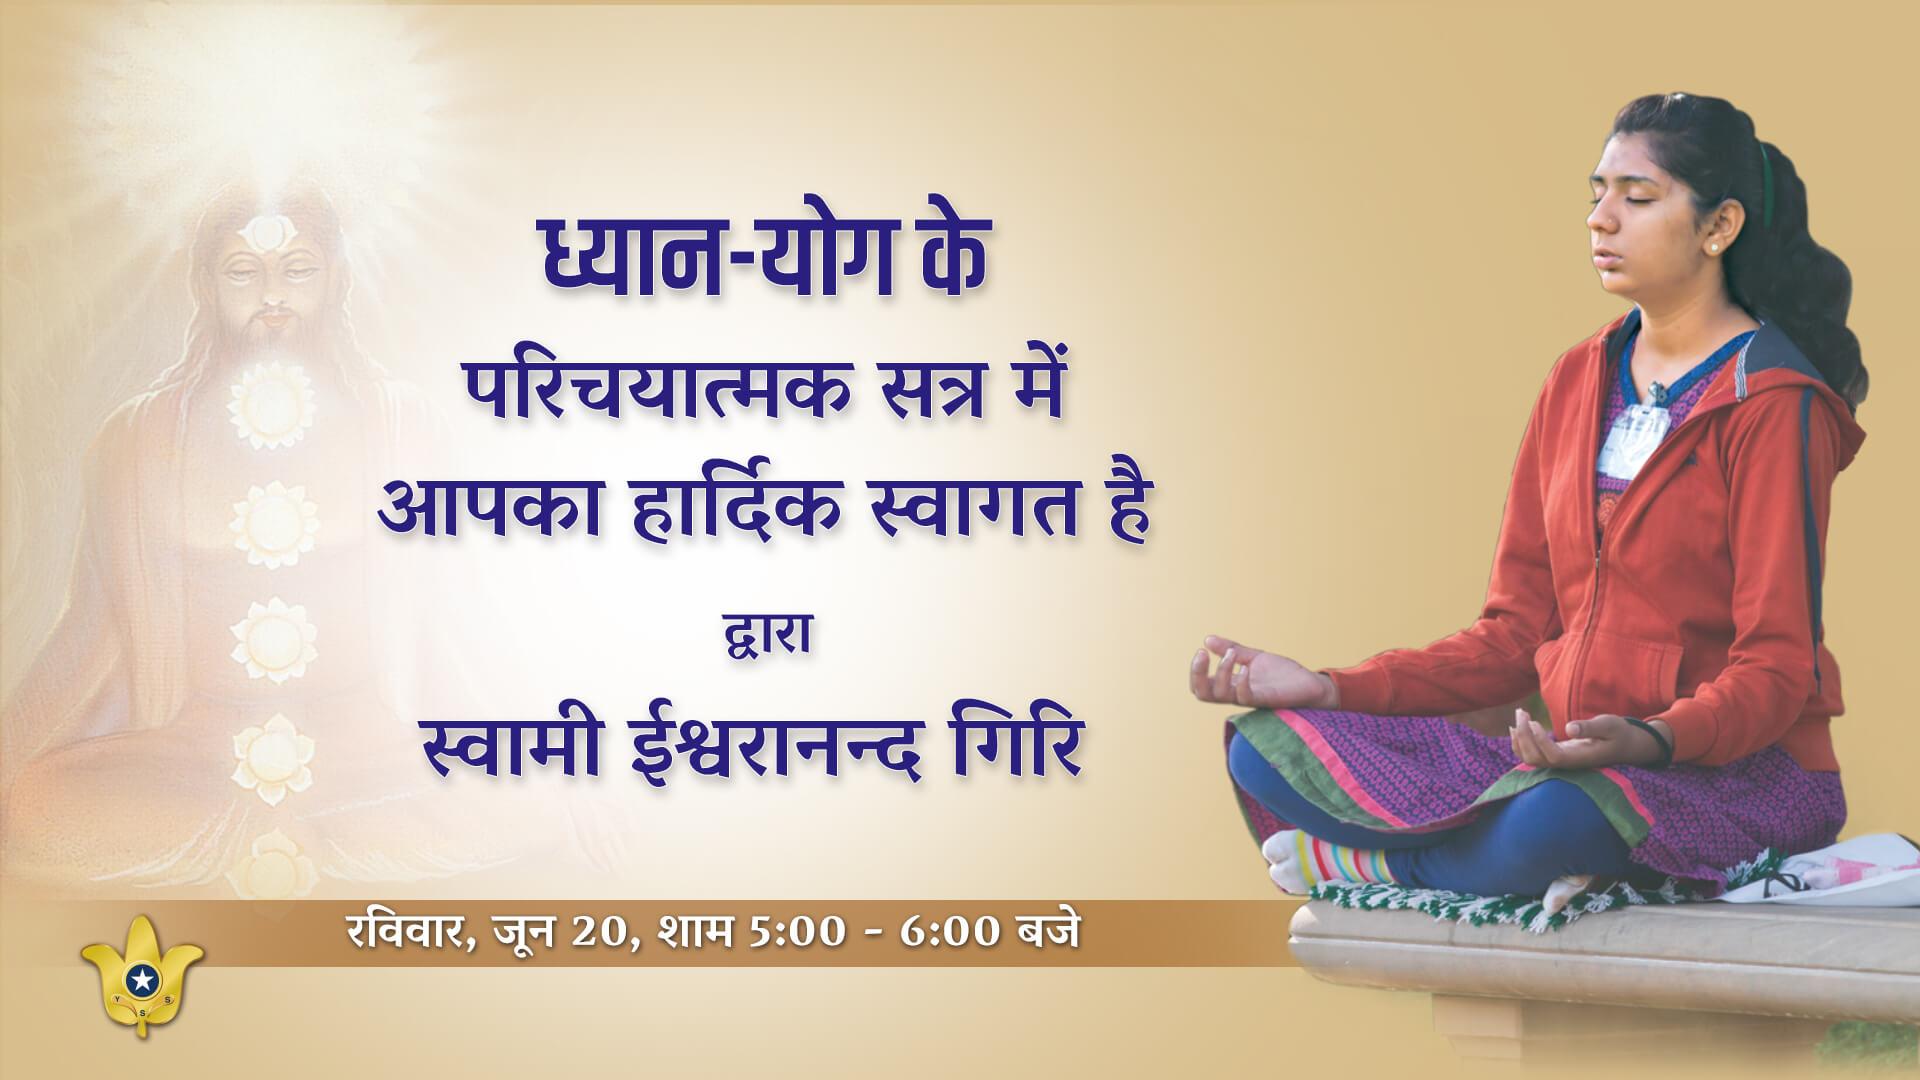 Introductory-Session-on-Yoga-Meditation-Hindi